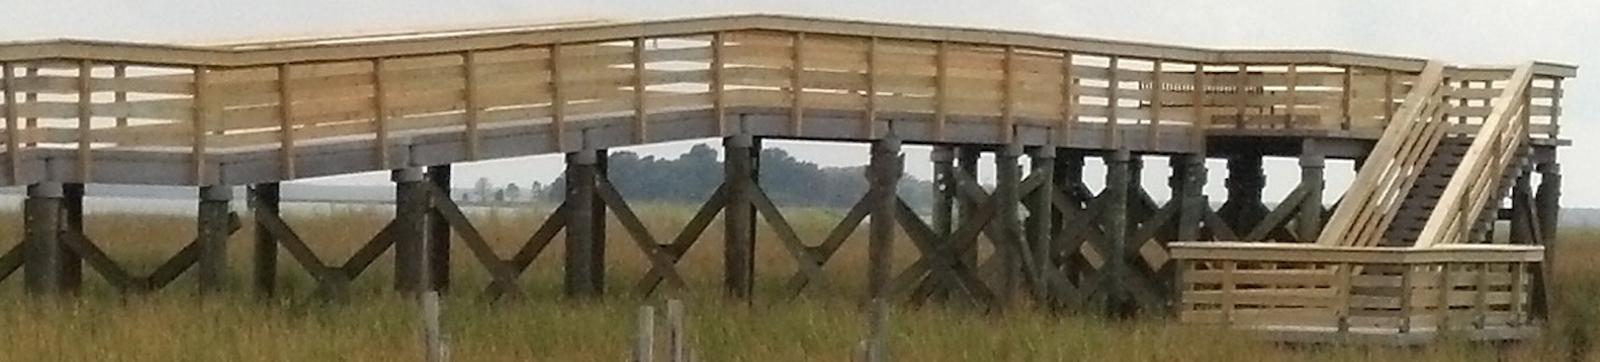 Wood Piling Construction : Concrete boardwalk construction timber piles